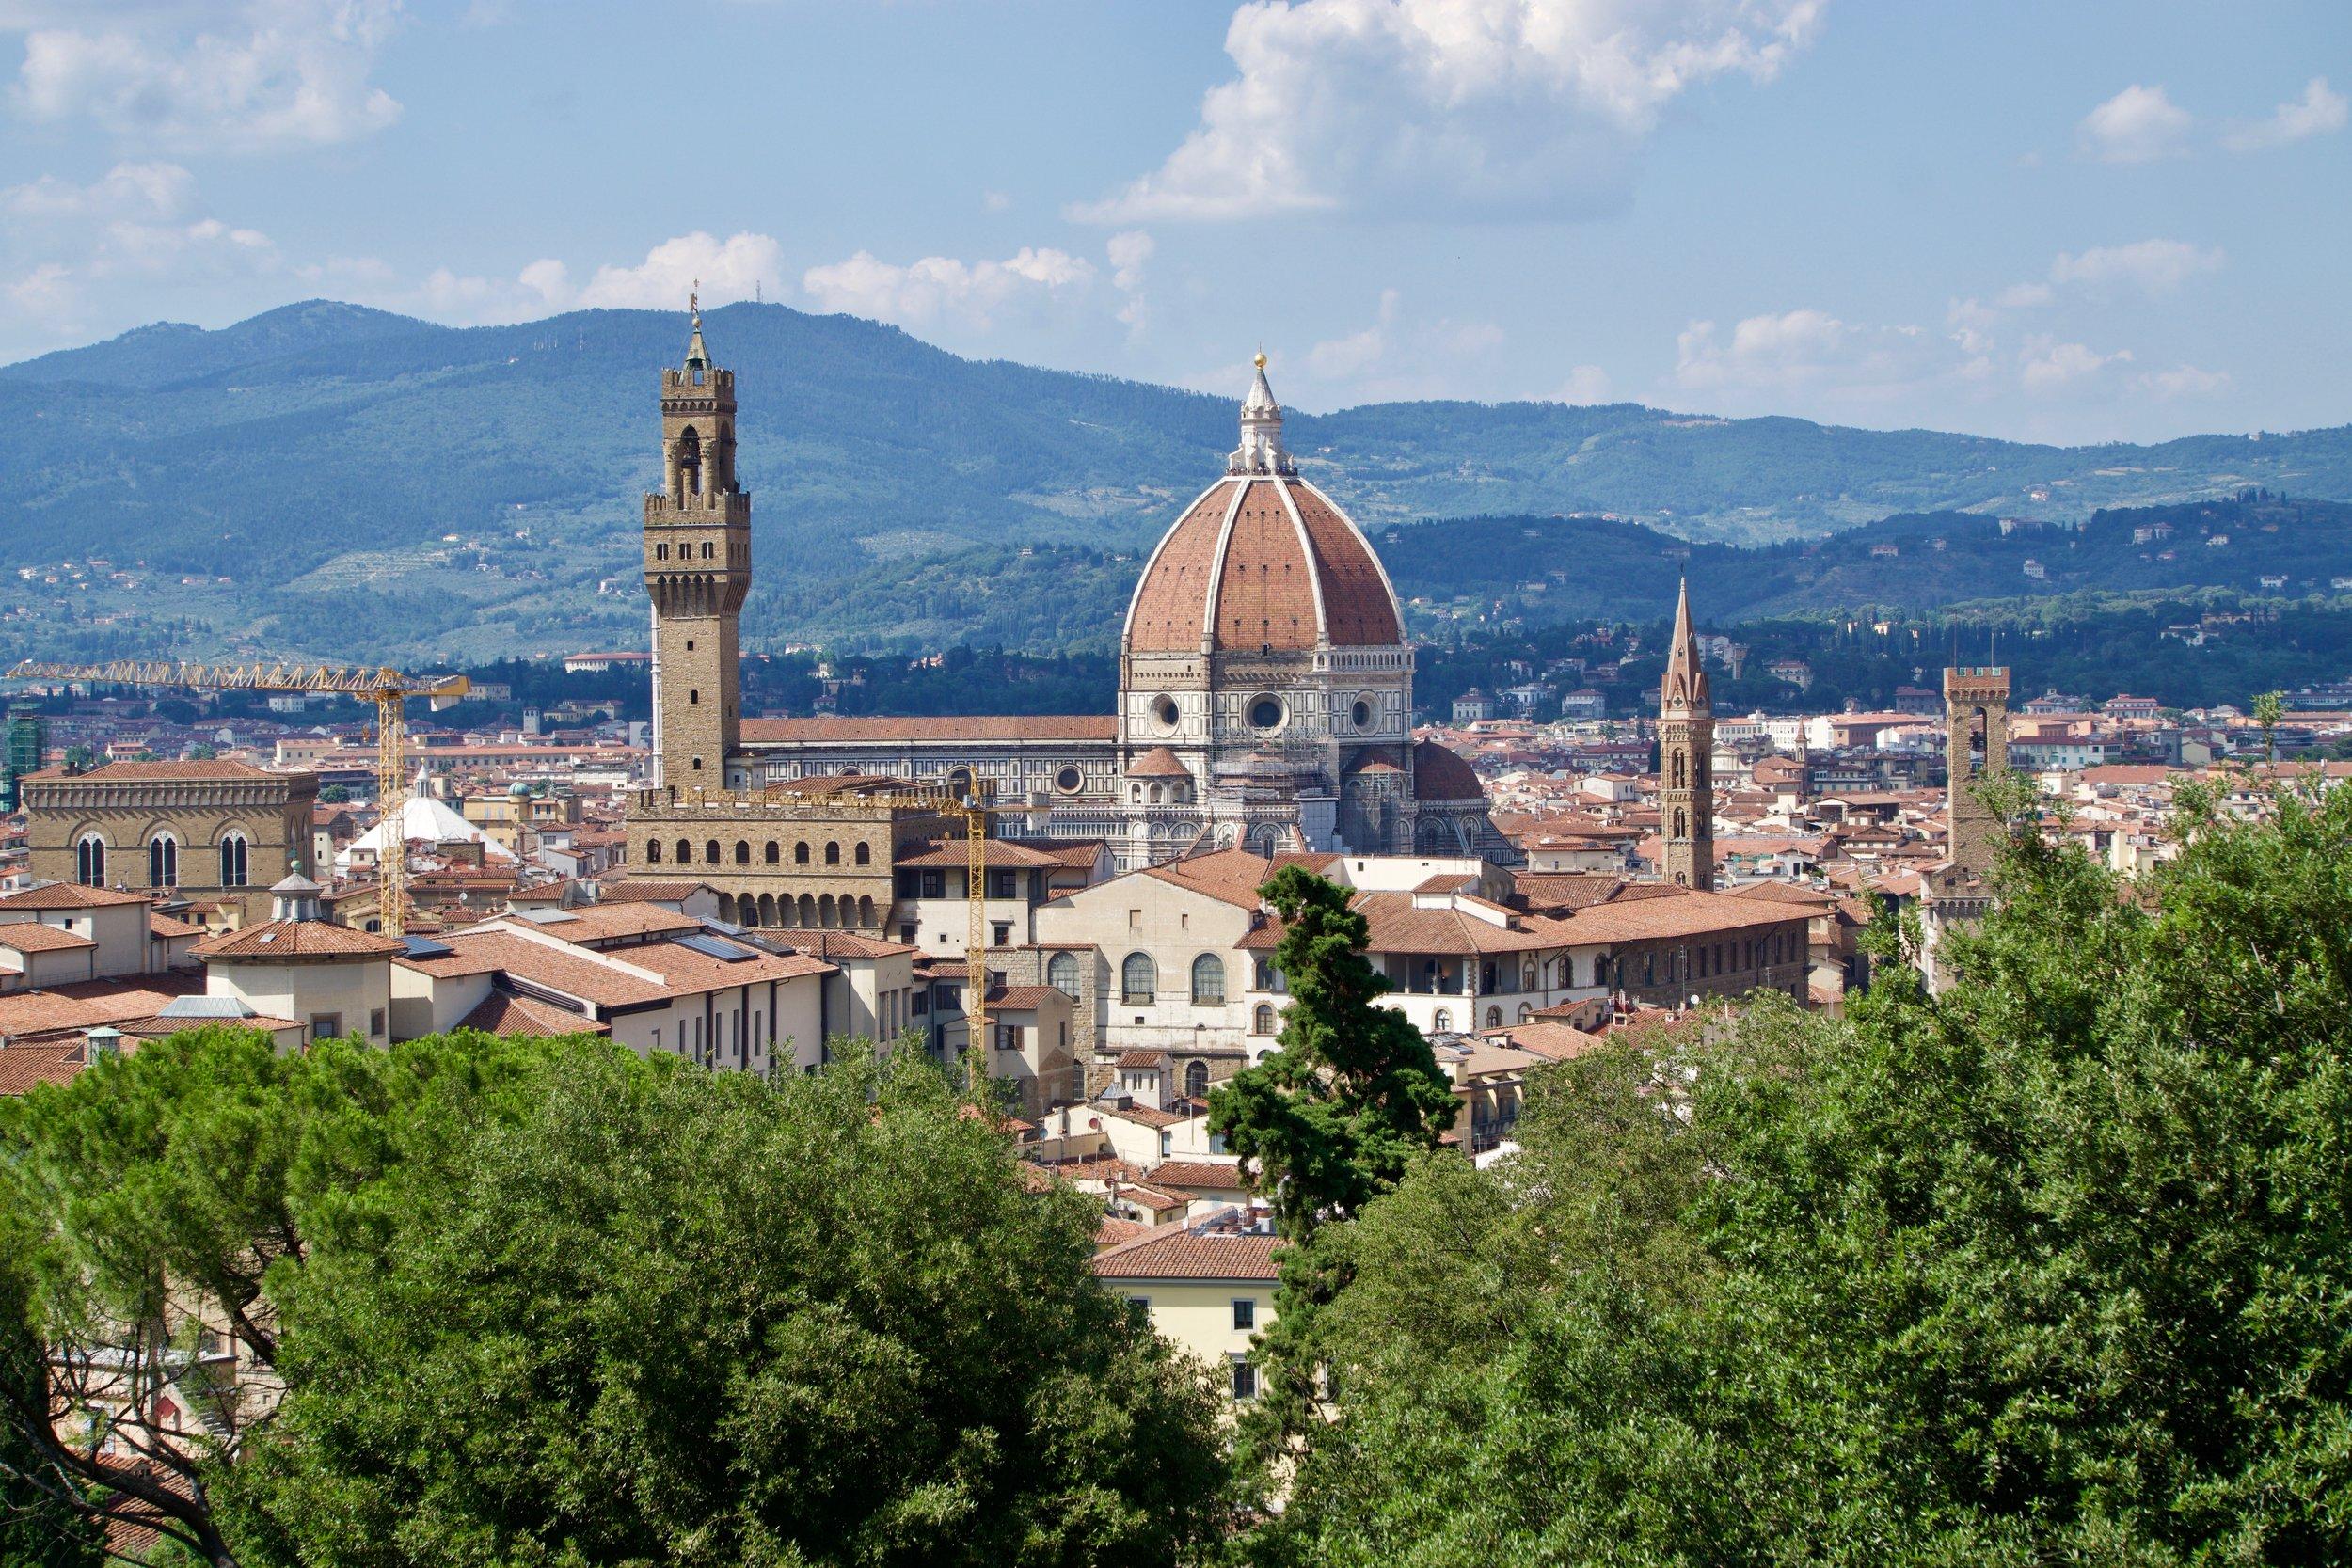 A view from the Giardino Bardini gardens